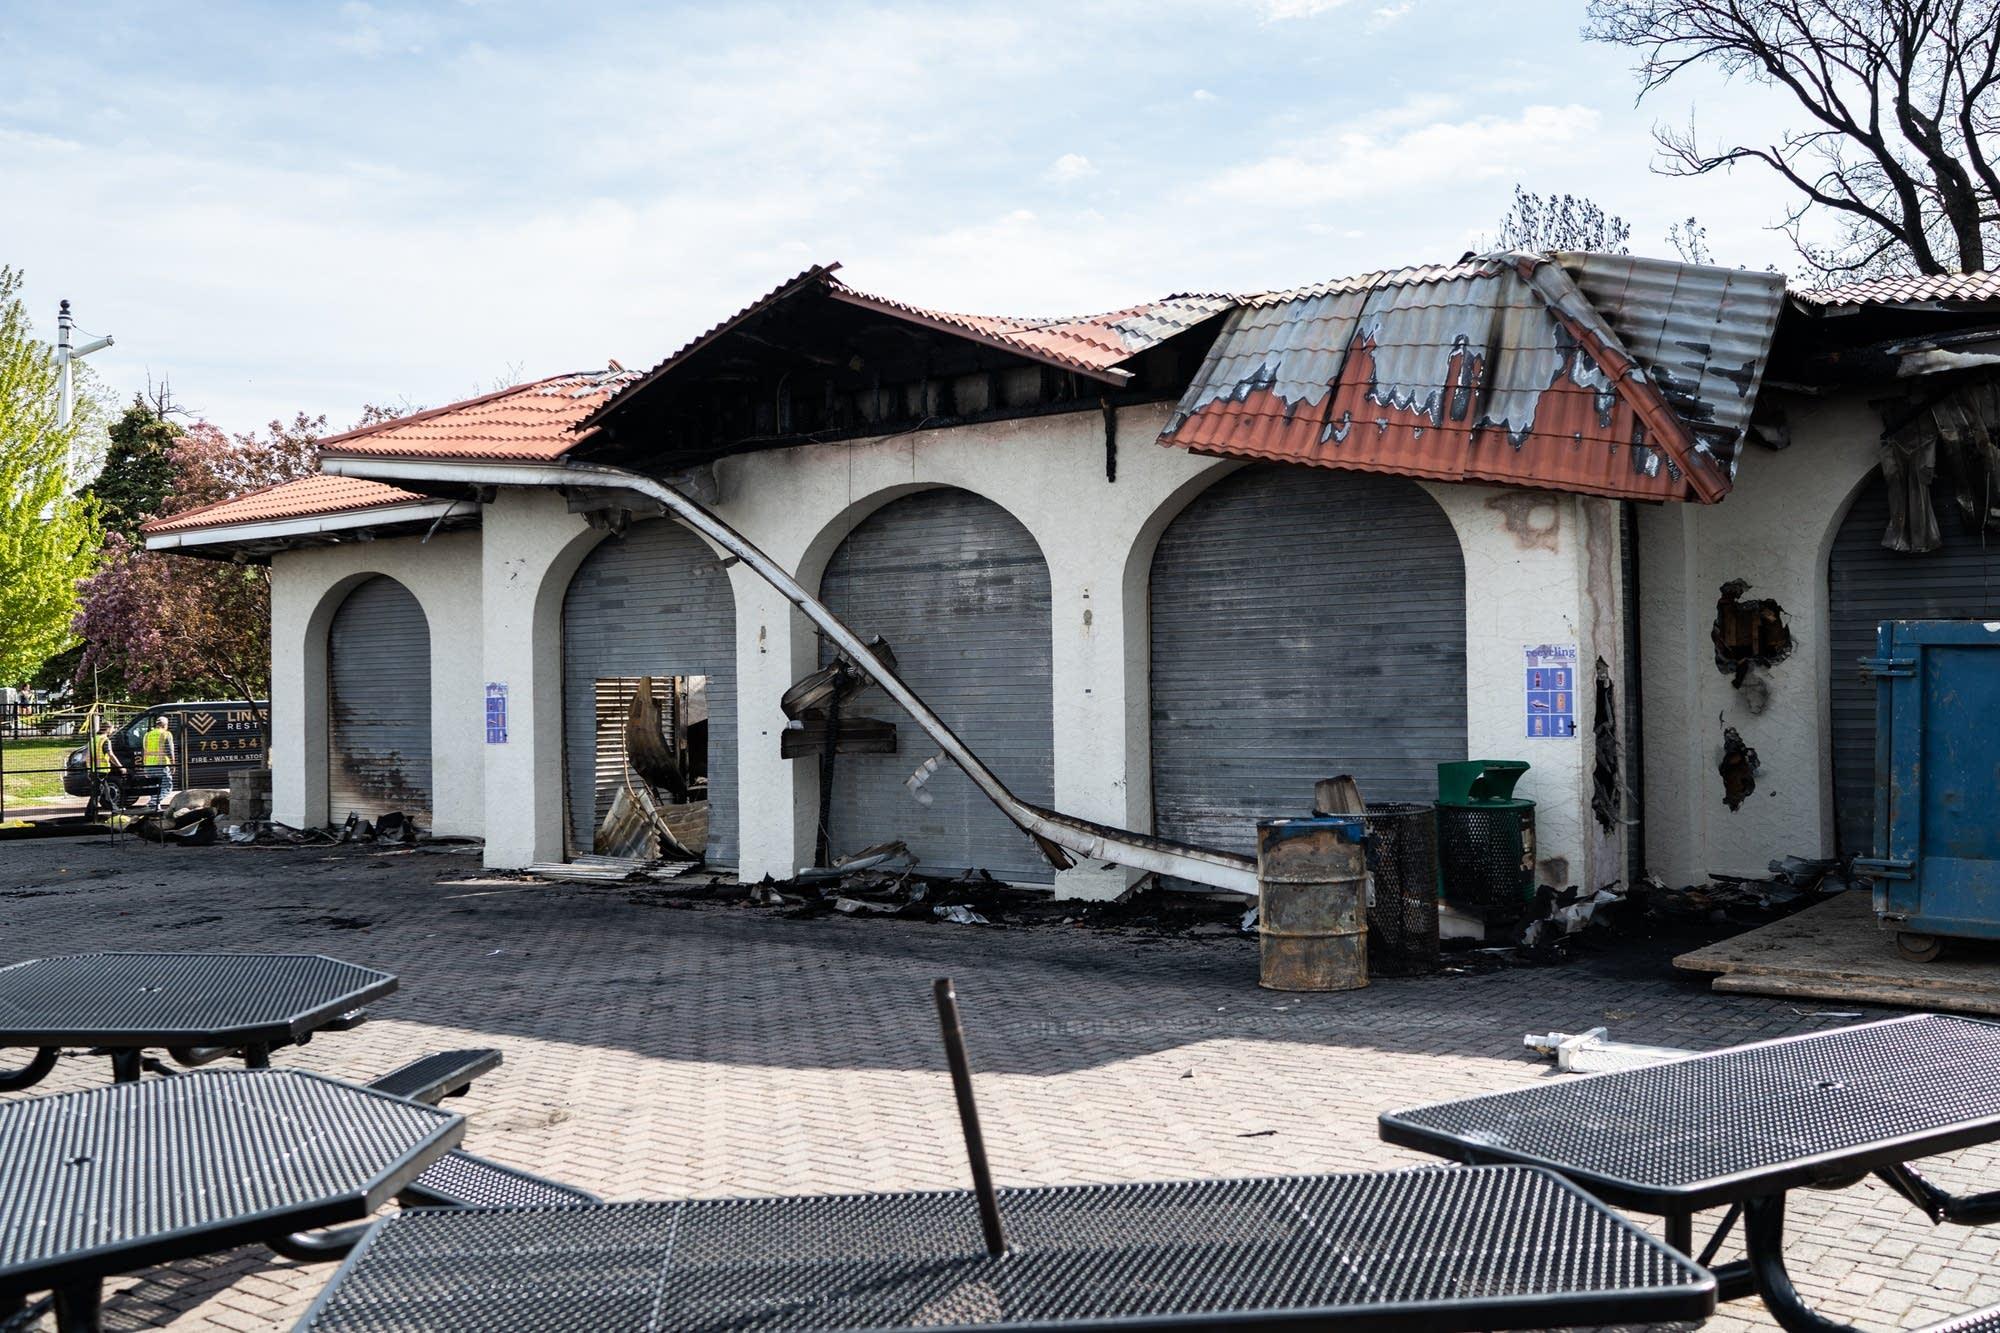 The roof of the pavilion on Bde Maka Ska.